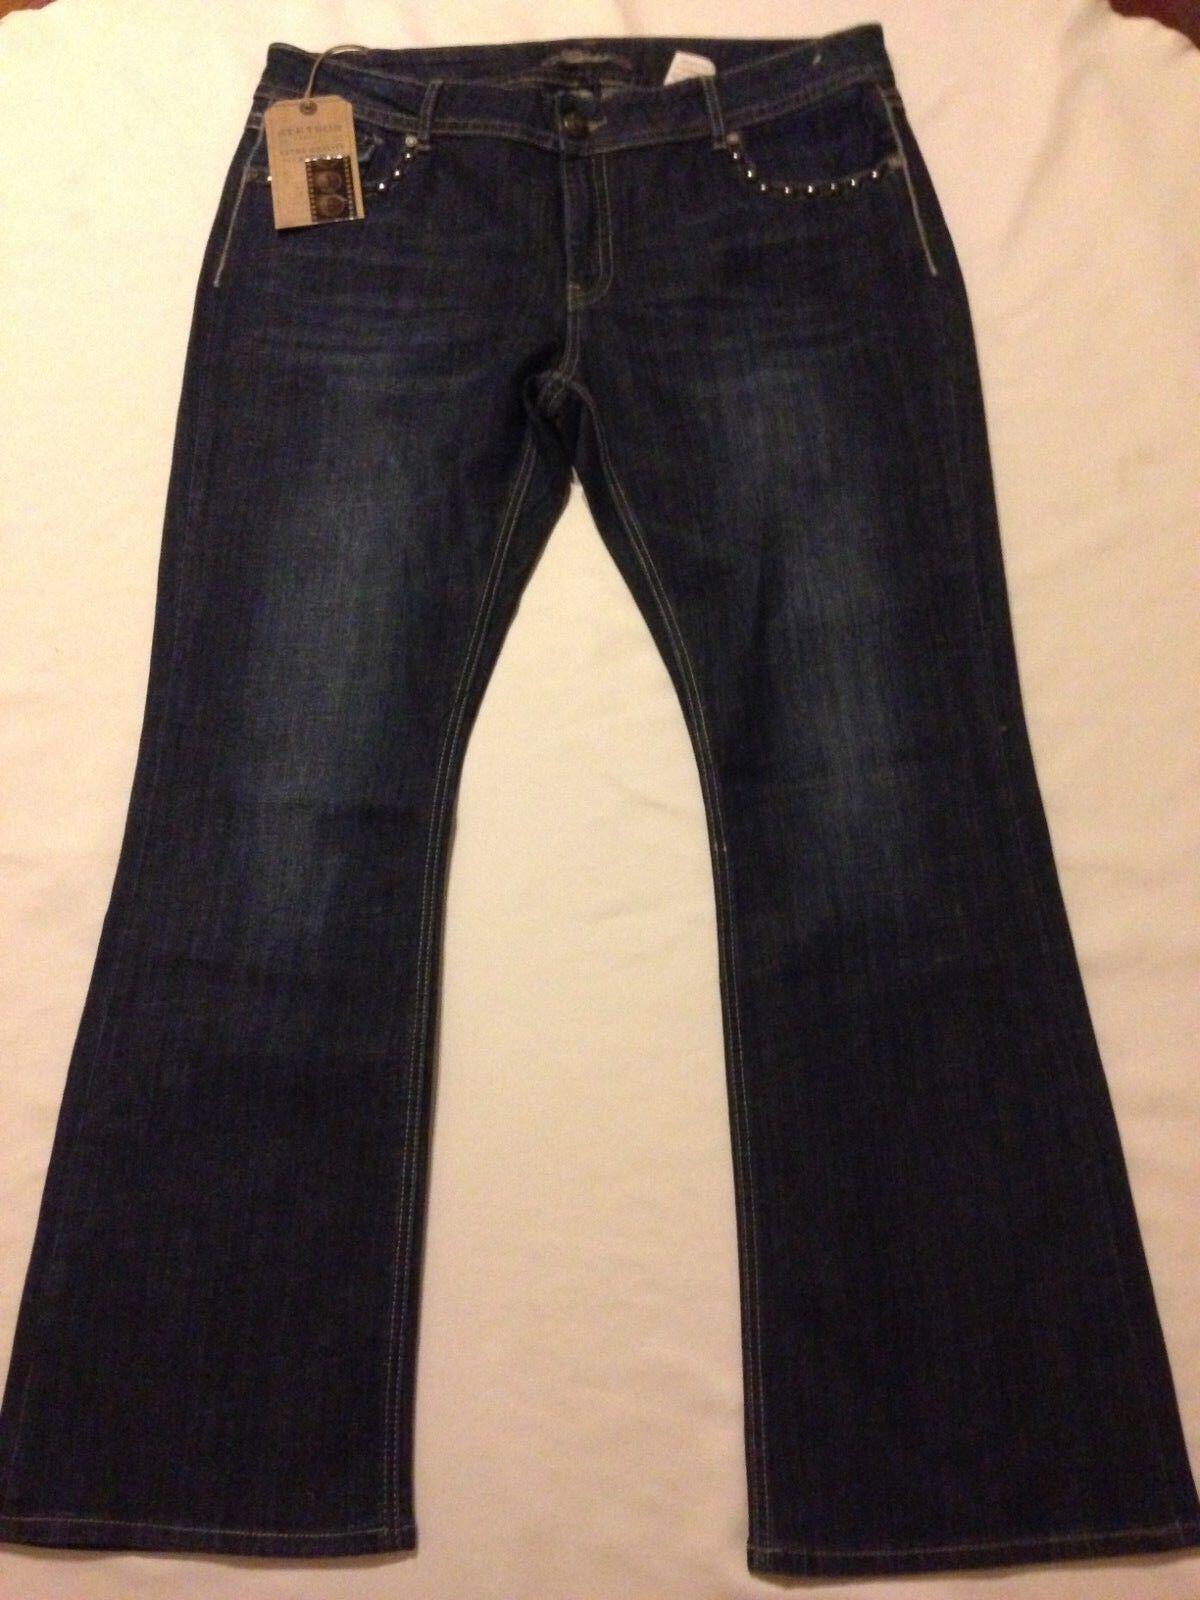 Nwt Stetson Hollywood Boot cut bluee jeans Women's size 22R (waist 40 inseam 32.5